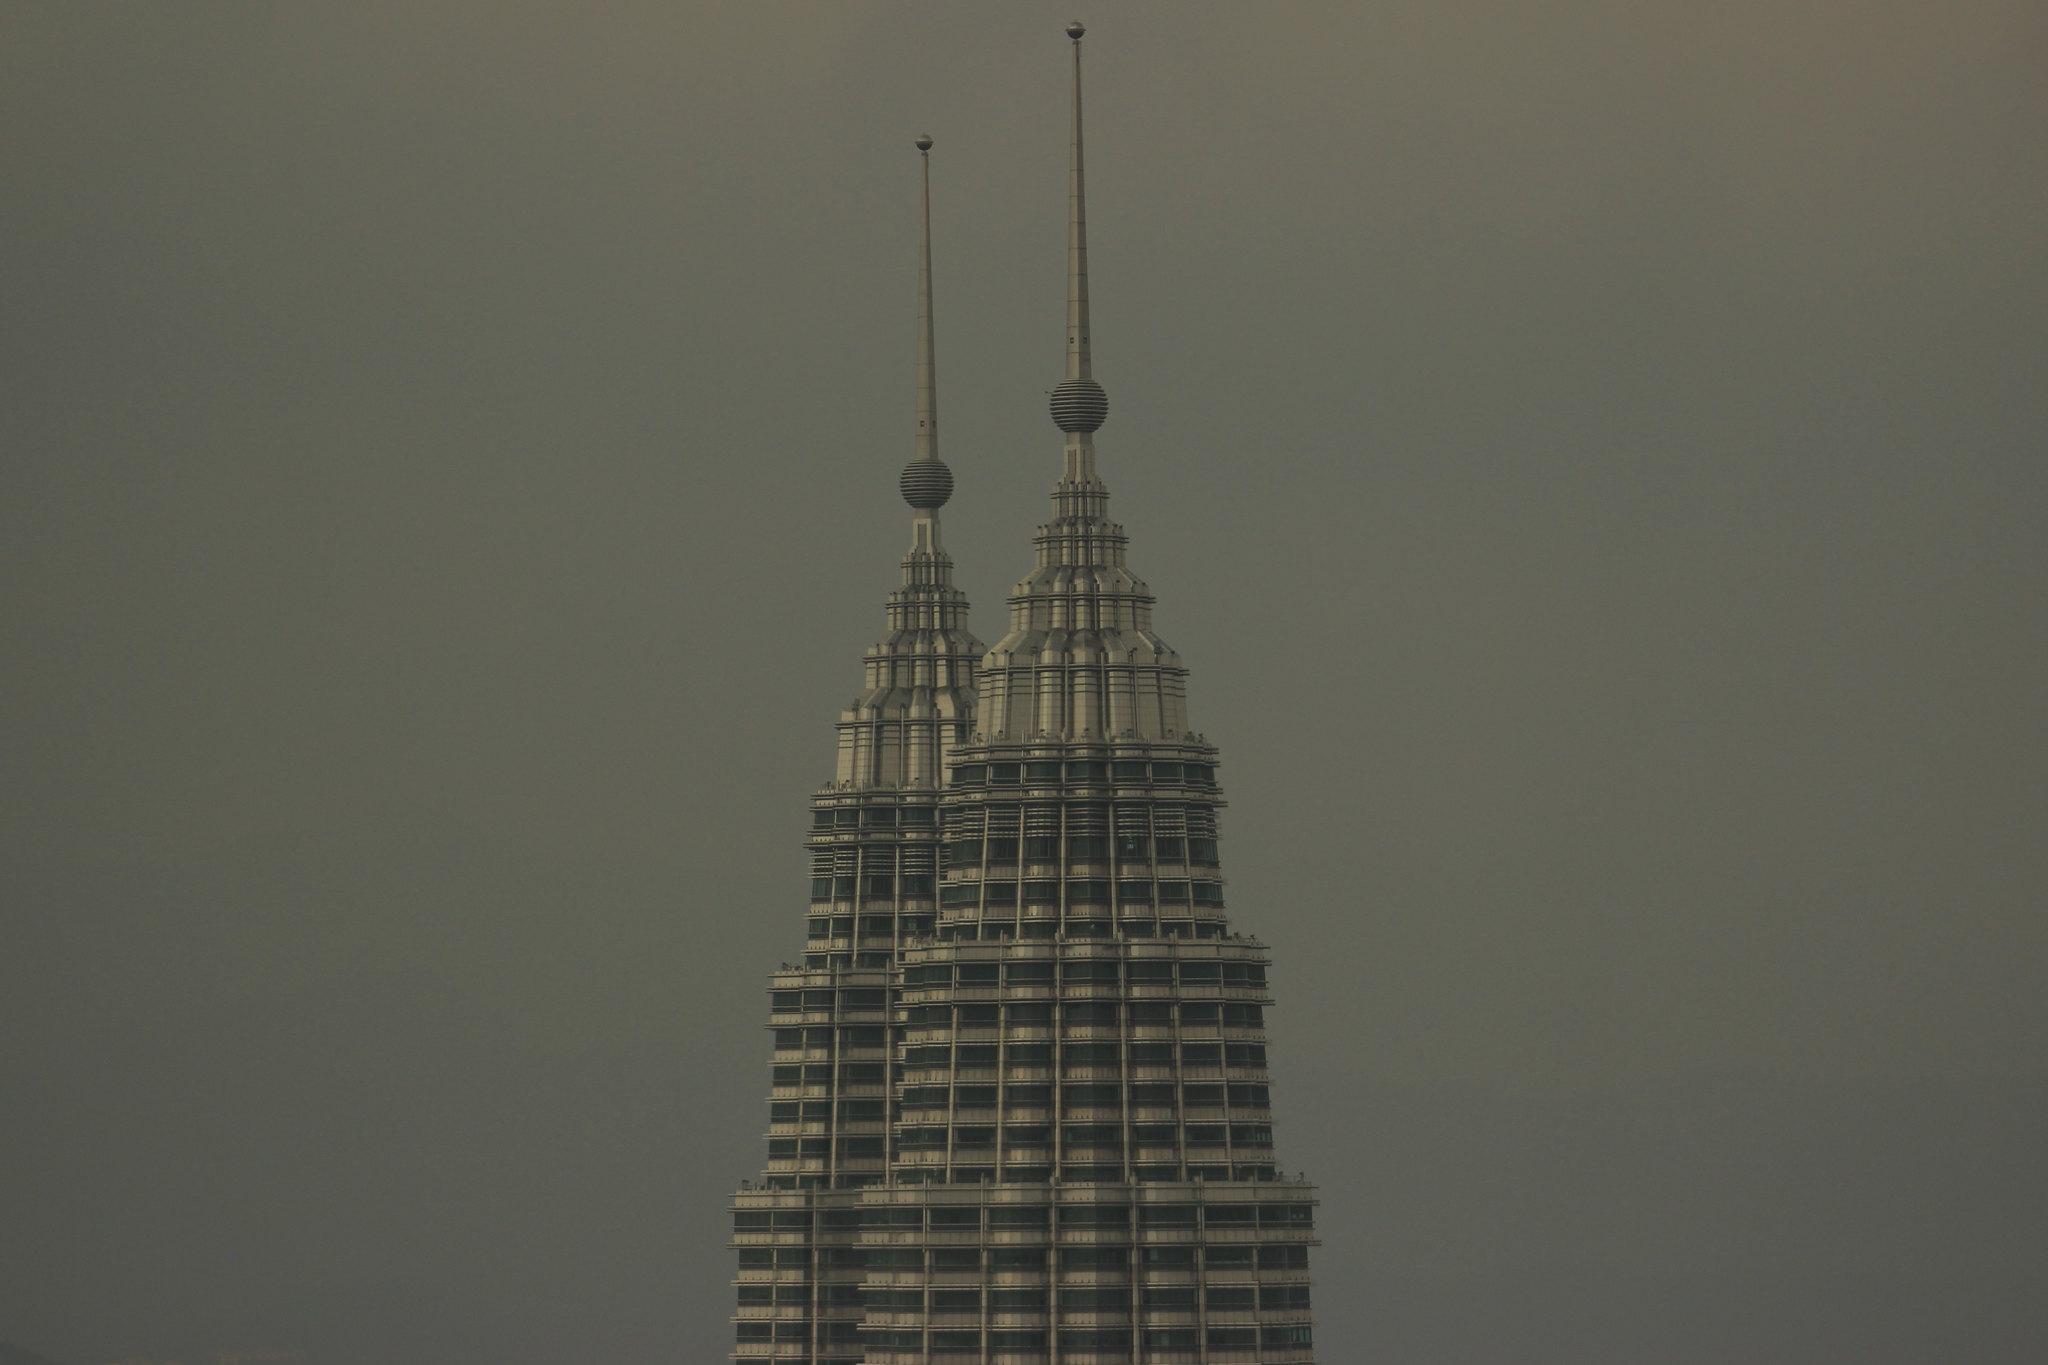 Petronas blending with the sky